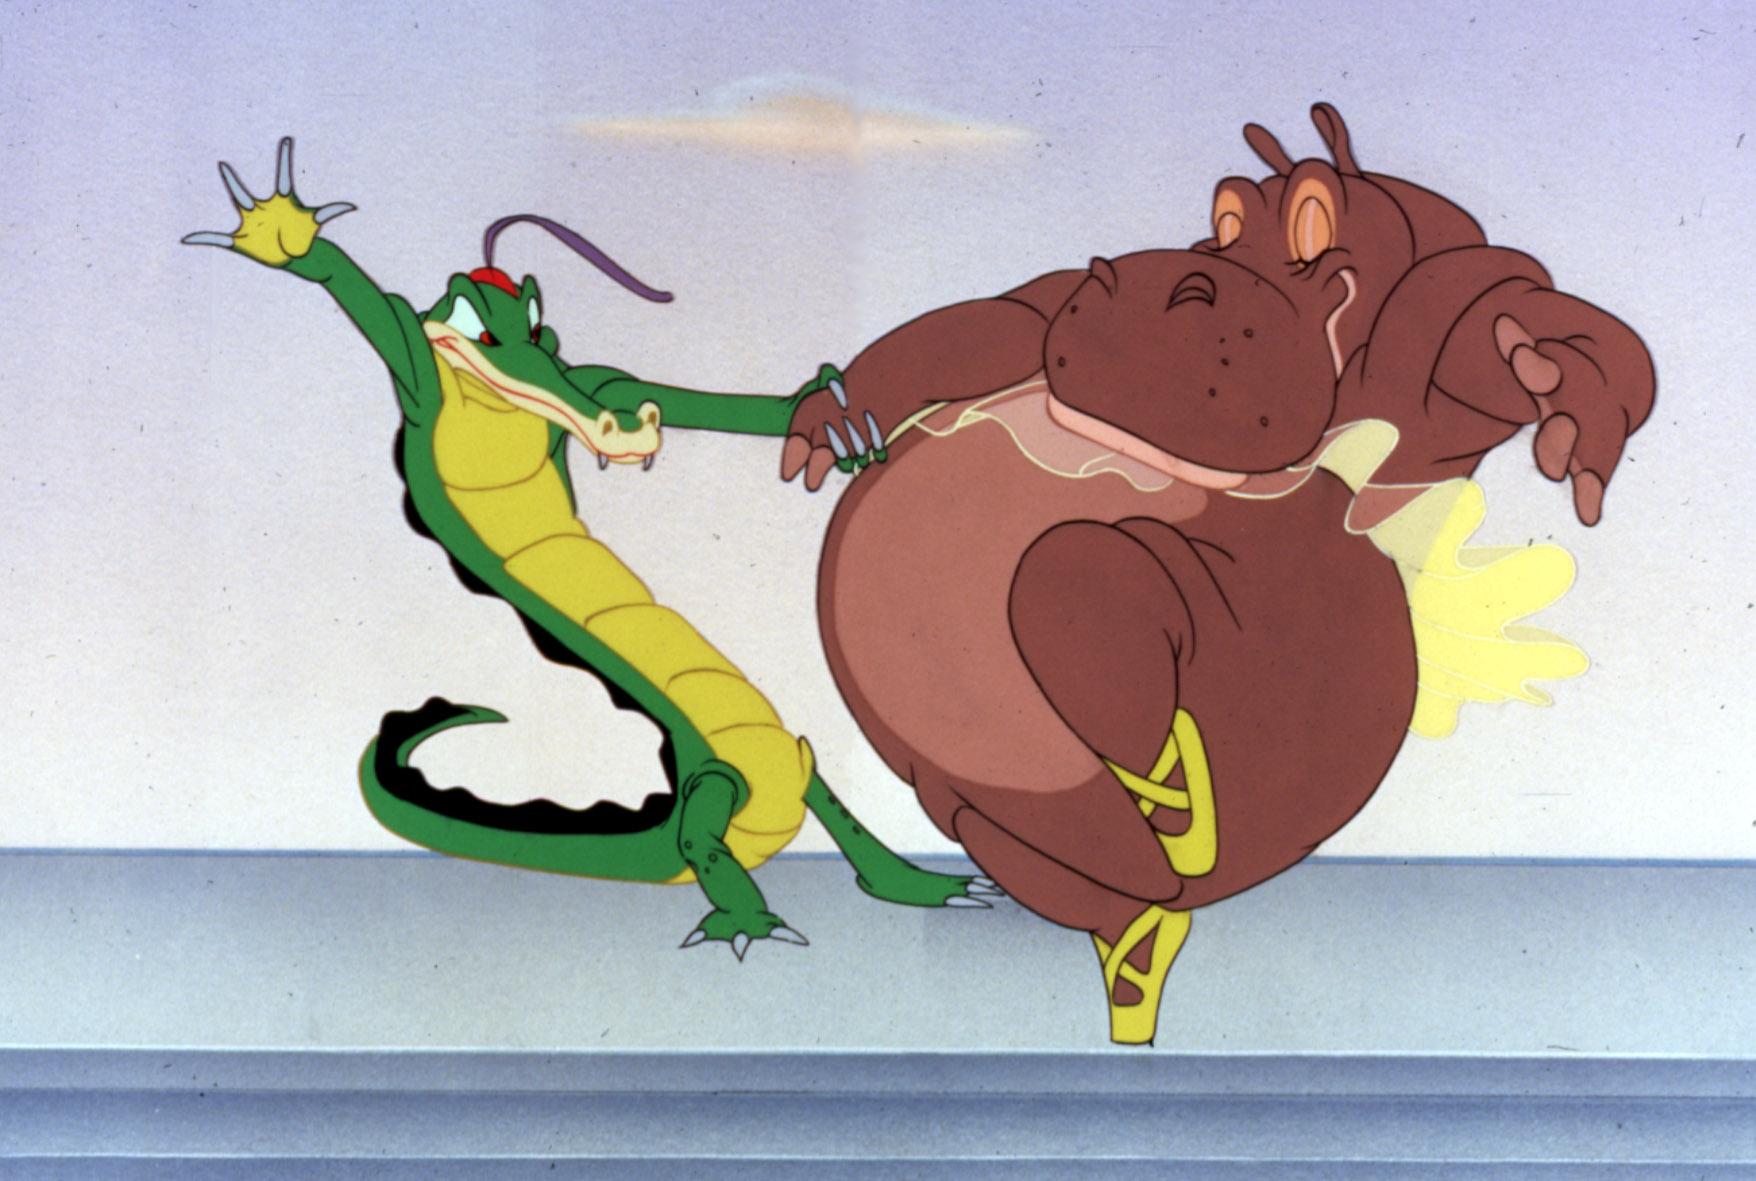 FANTASIA, Hippo, Alligator, 1940. (c) Walt Disney Productions/Everett Collection